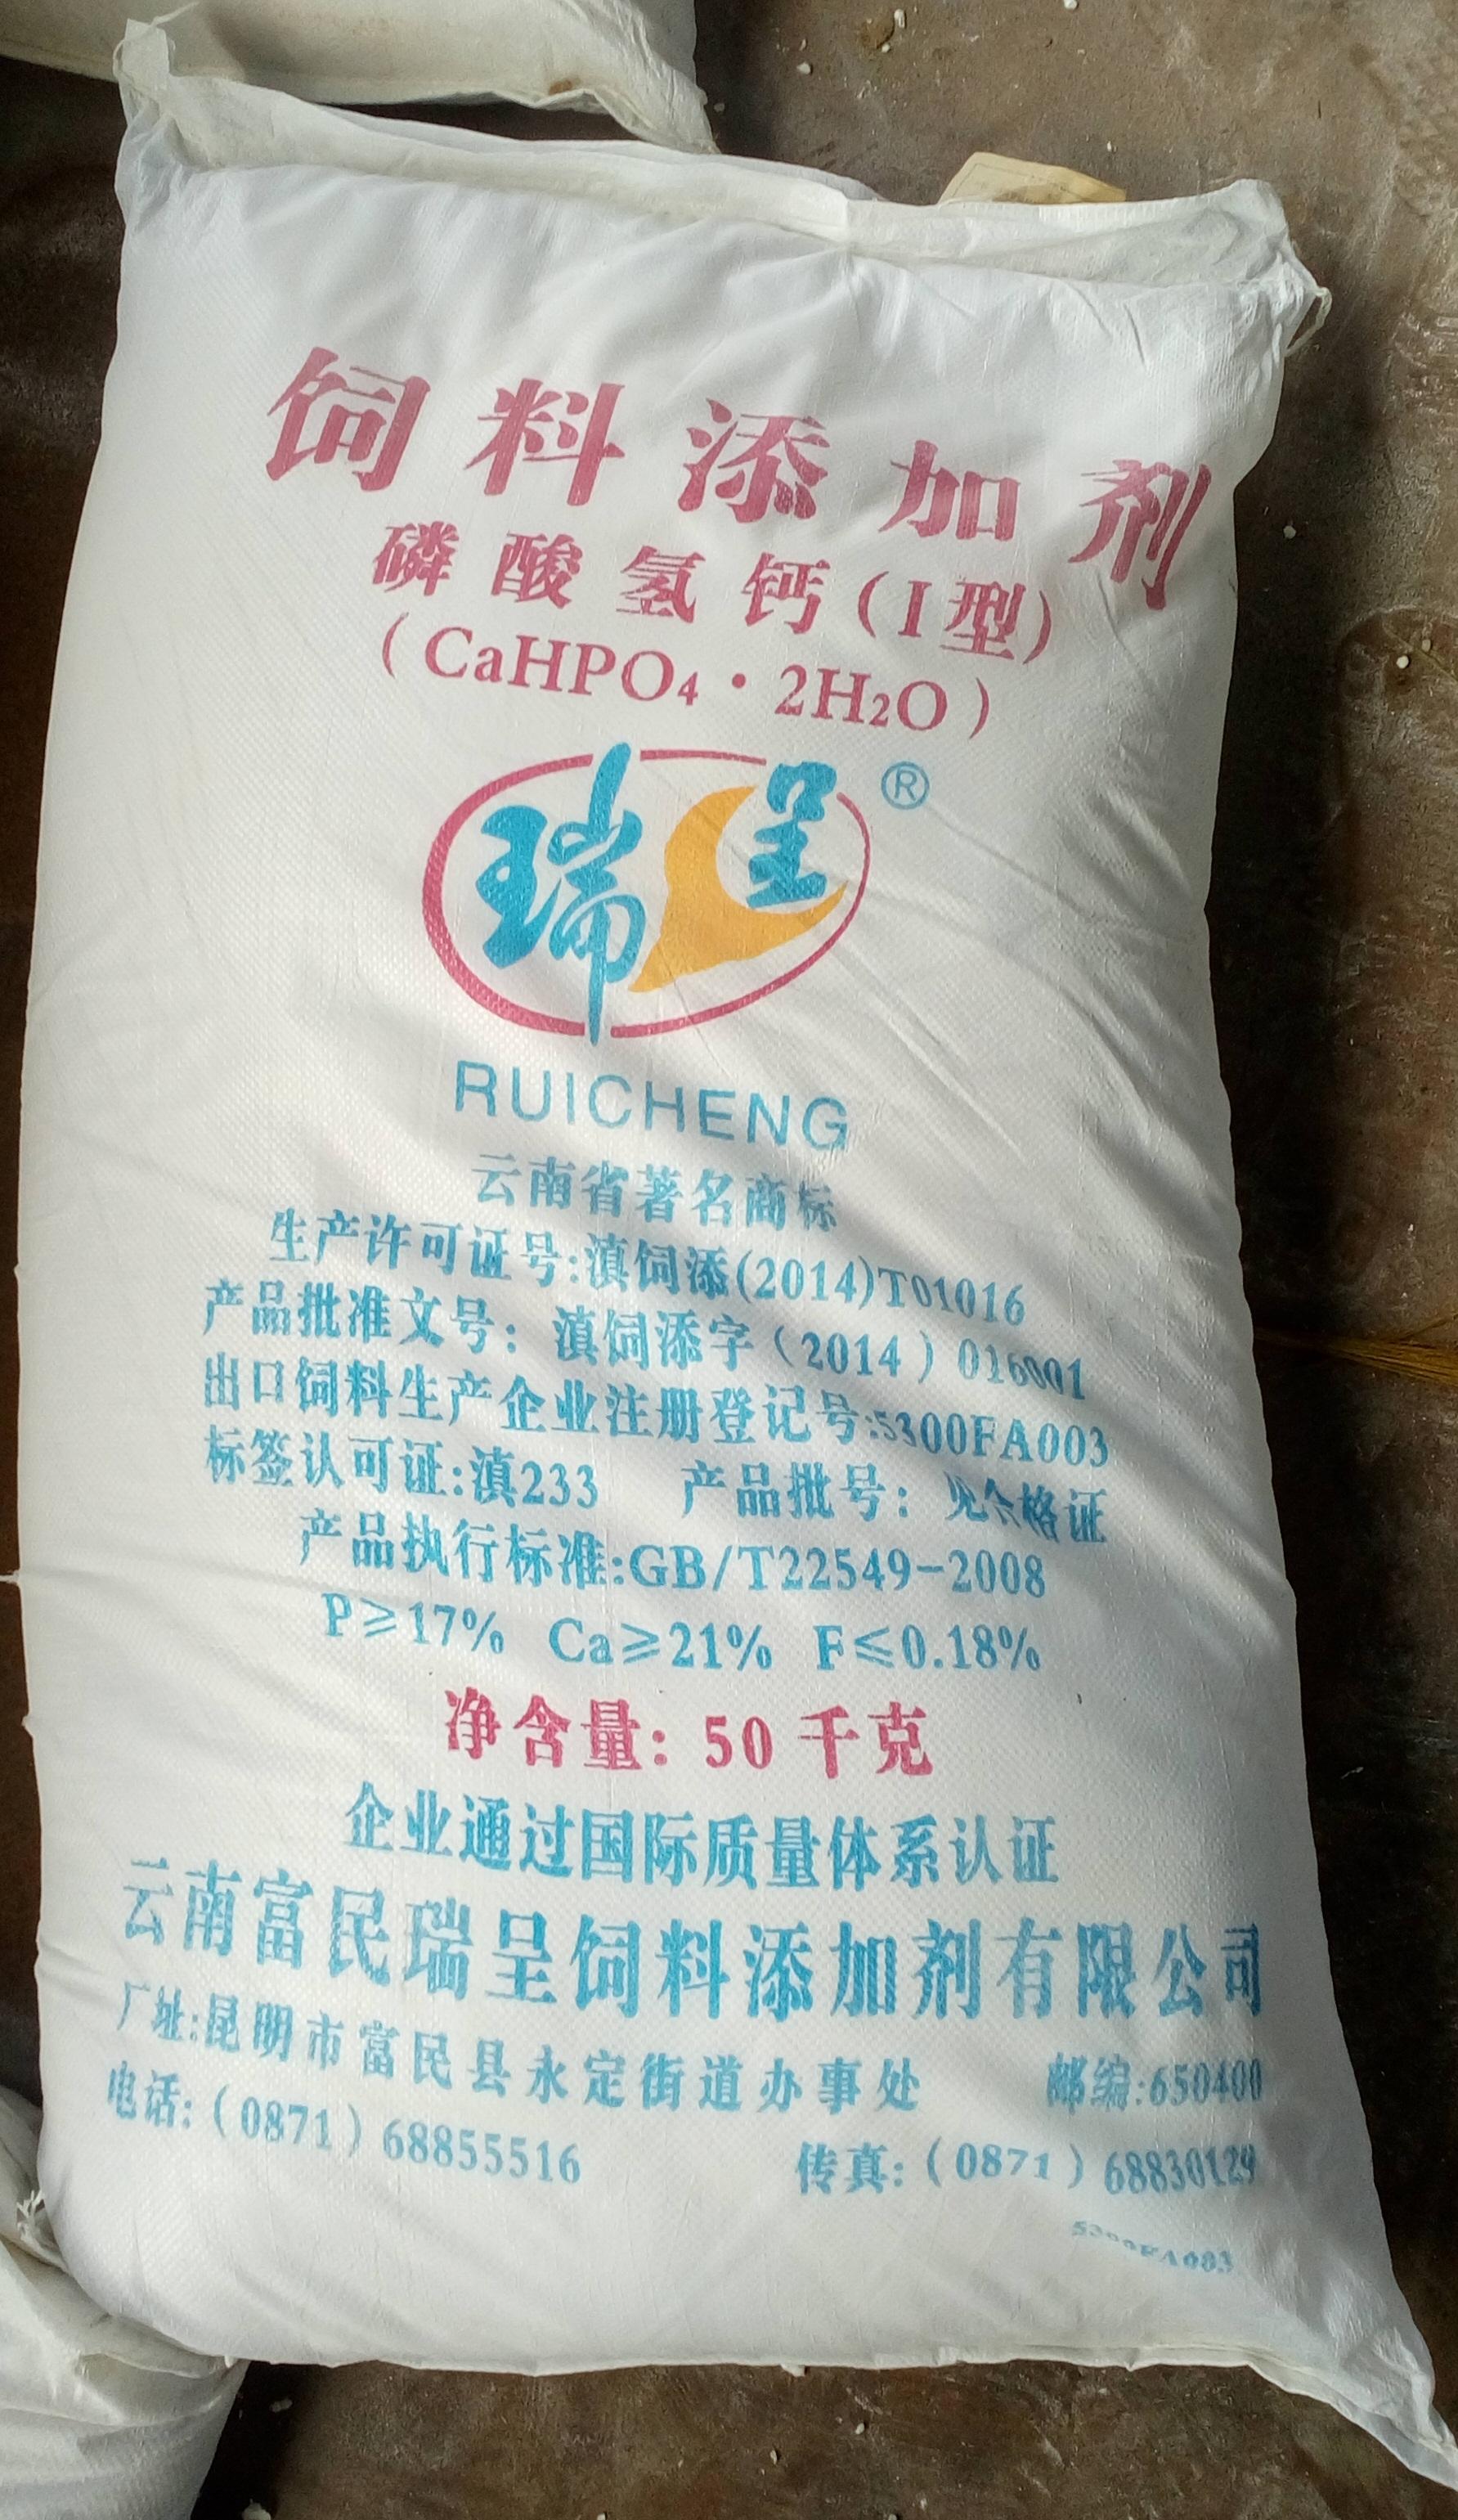 Dicalcium Phosphate (DCP) Thủy Trình